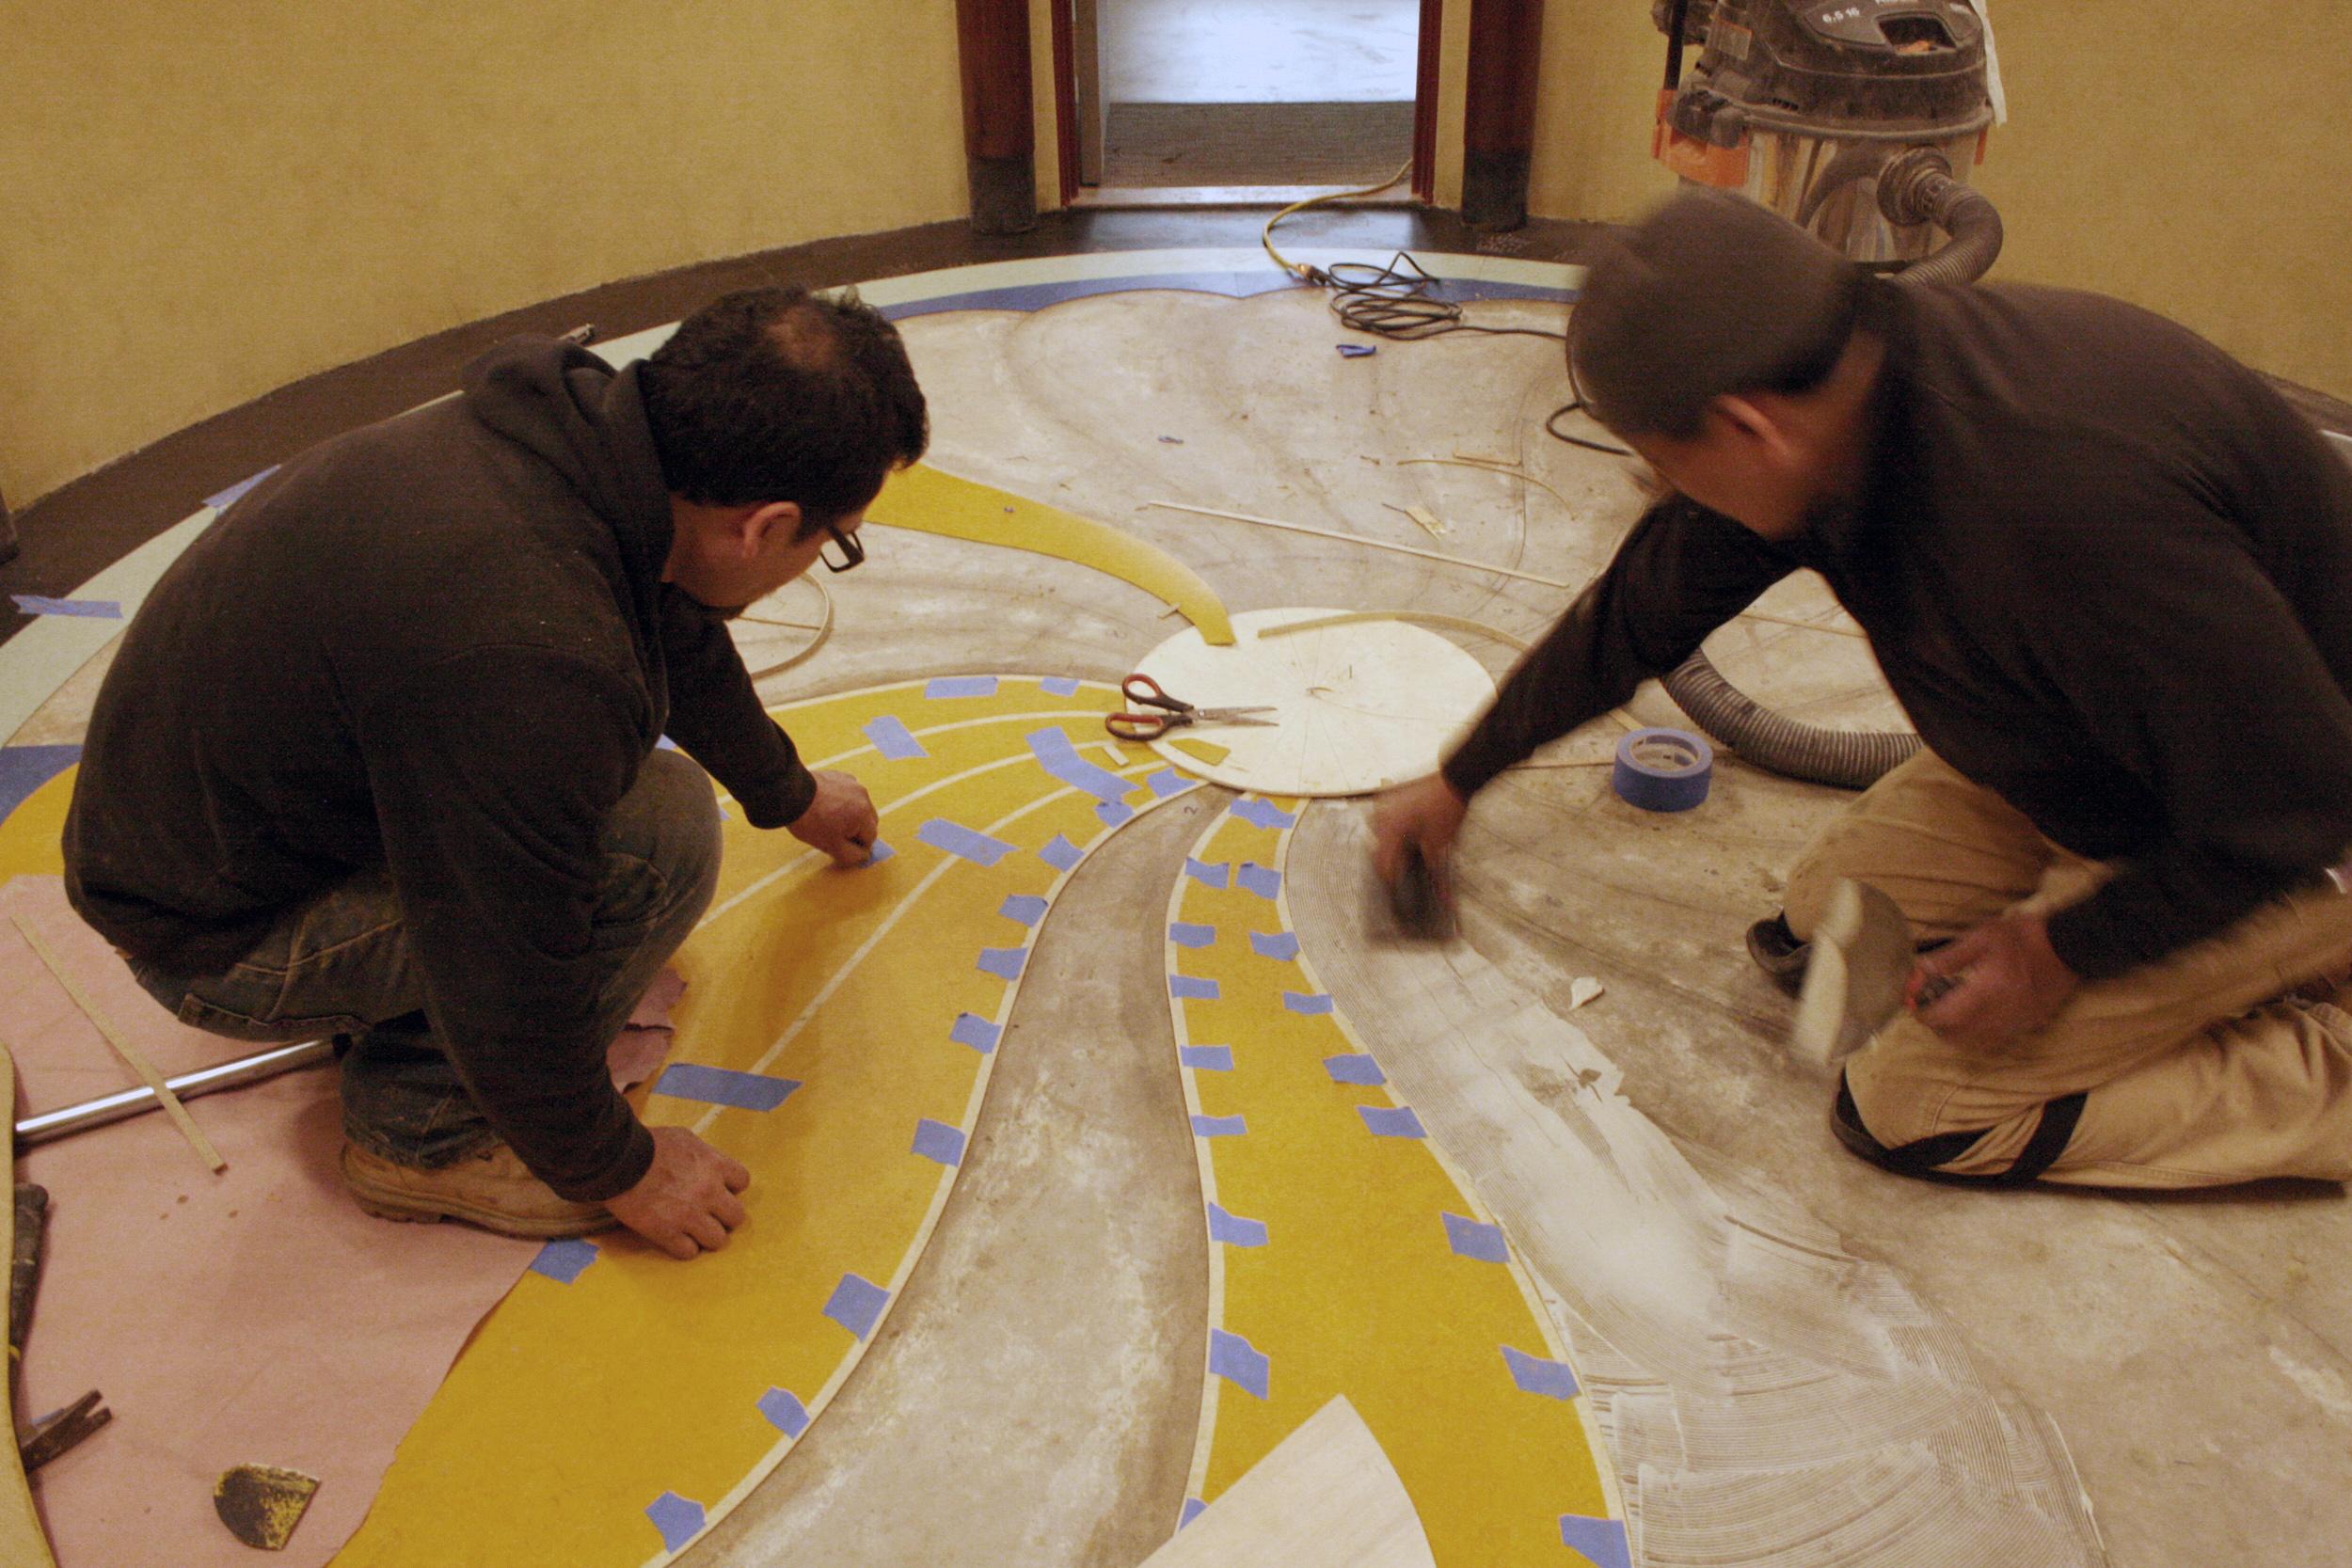 Installation of Powder Room inlaid linoleum floor.